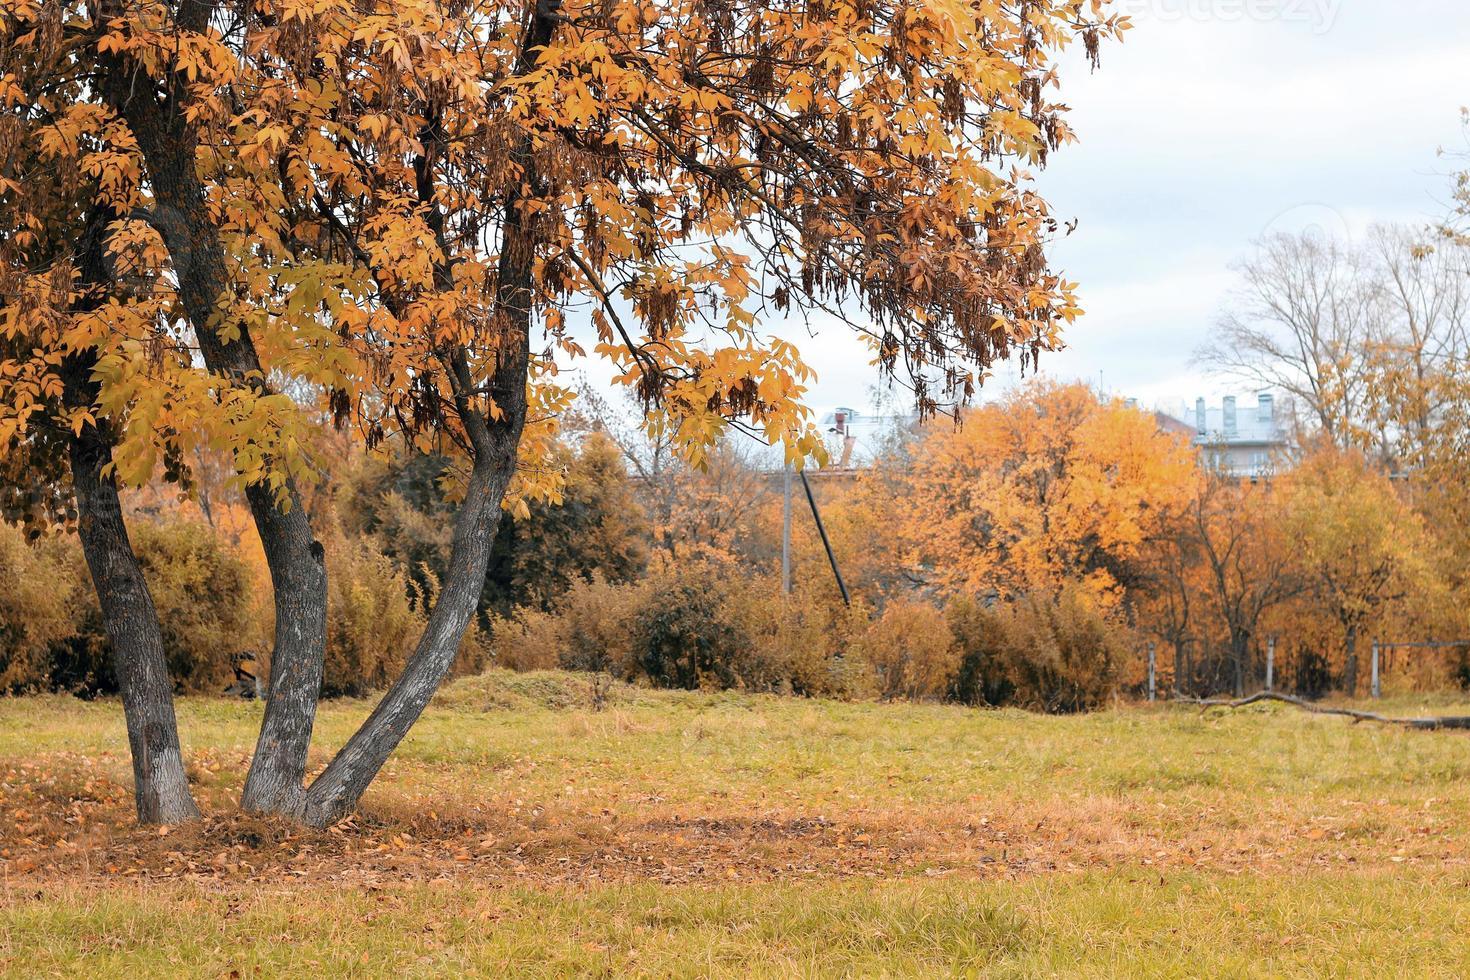 parco paesaggio albero solitario foto